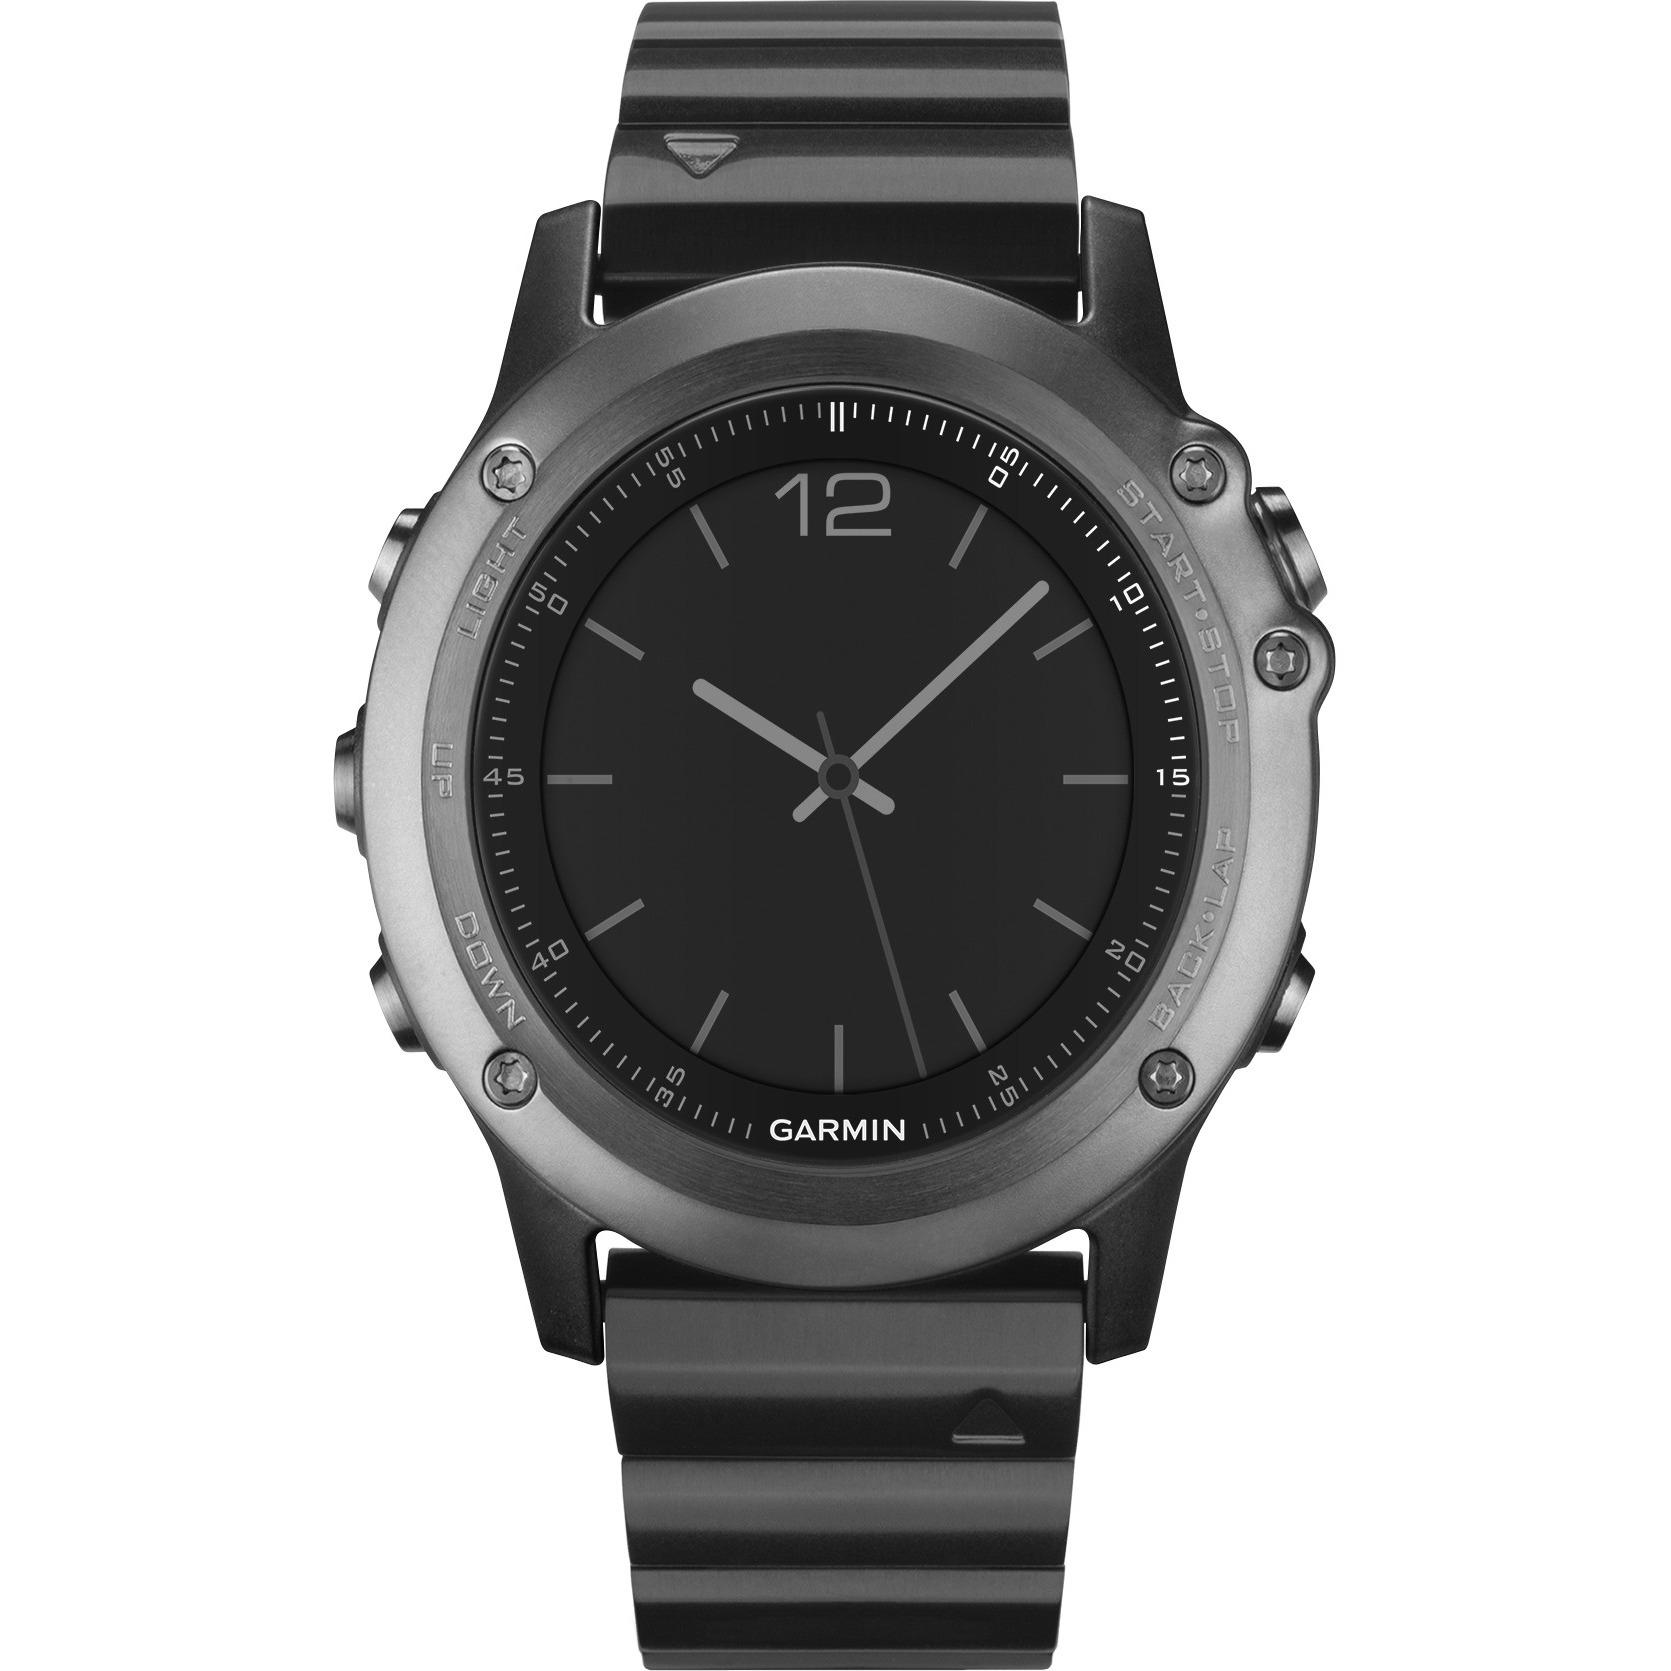 Garmin fenix 3 Sapphire with Metal Band - GPS/GLONASS watch - cycle, running, swimming - display: 1.2 in